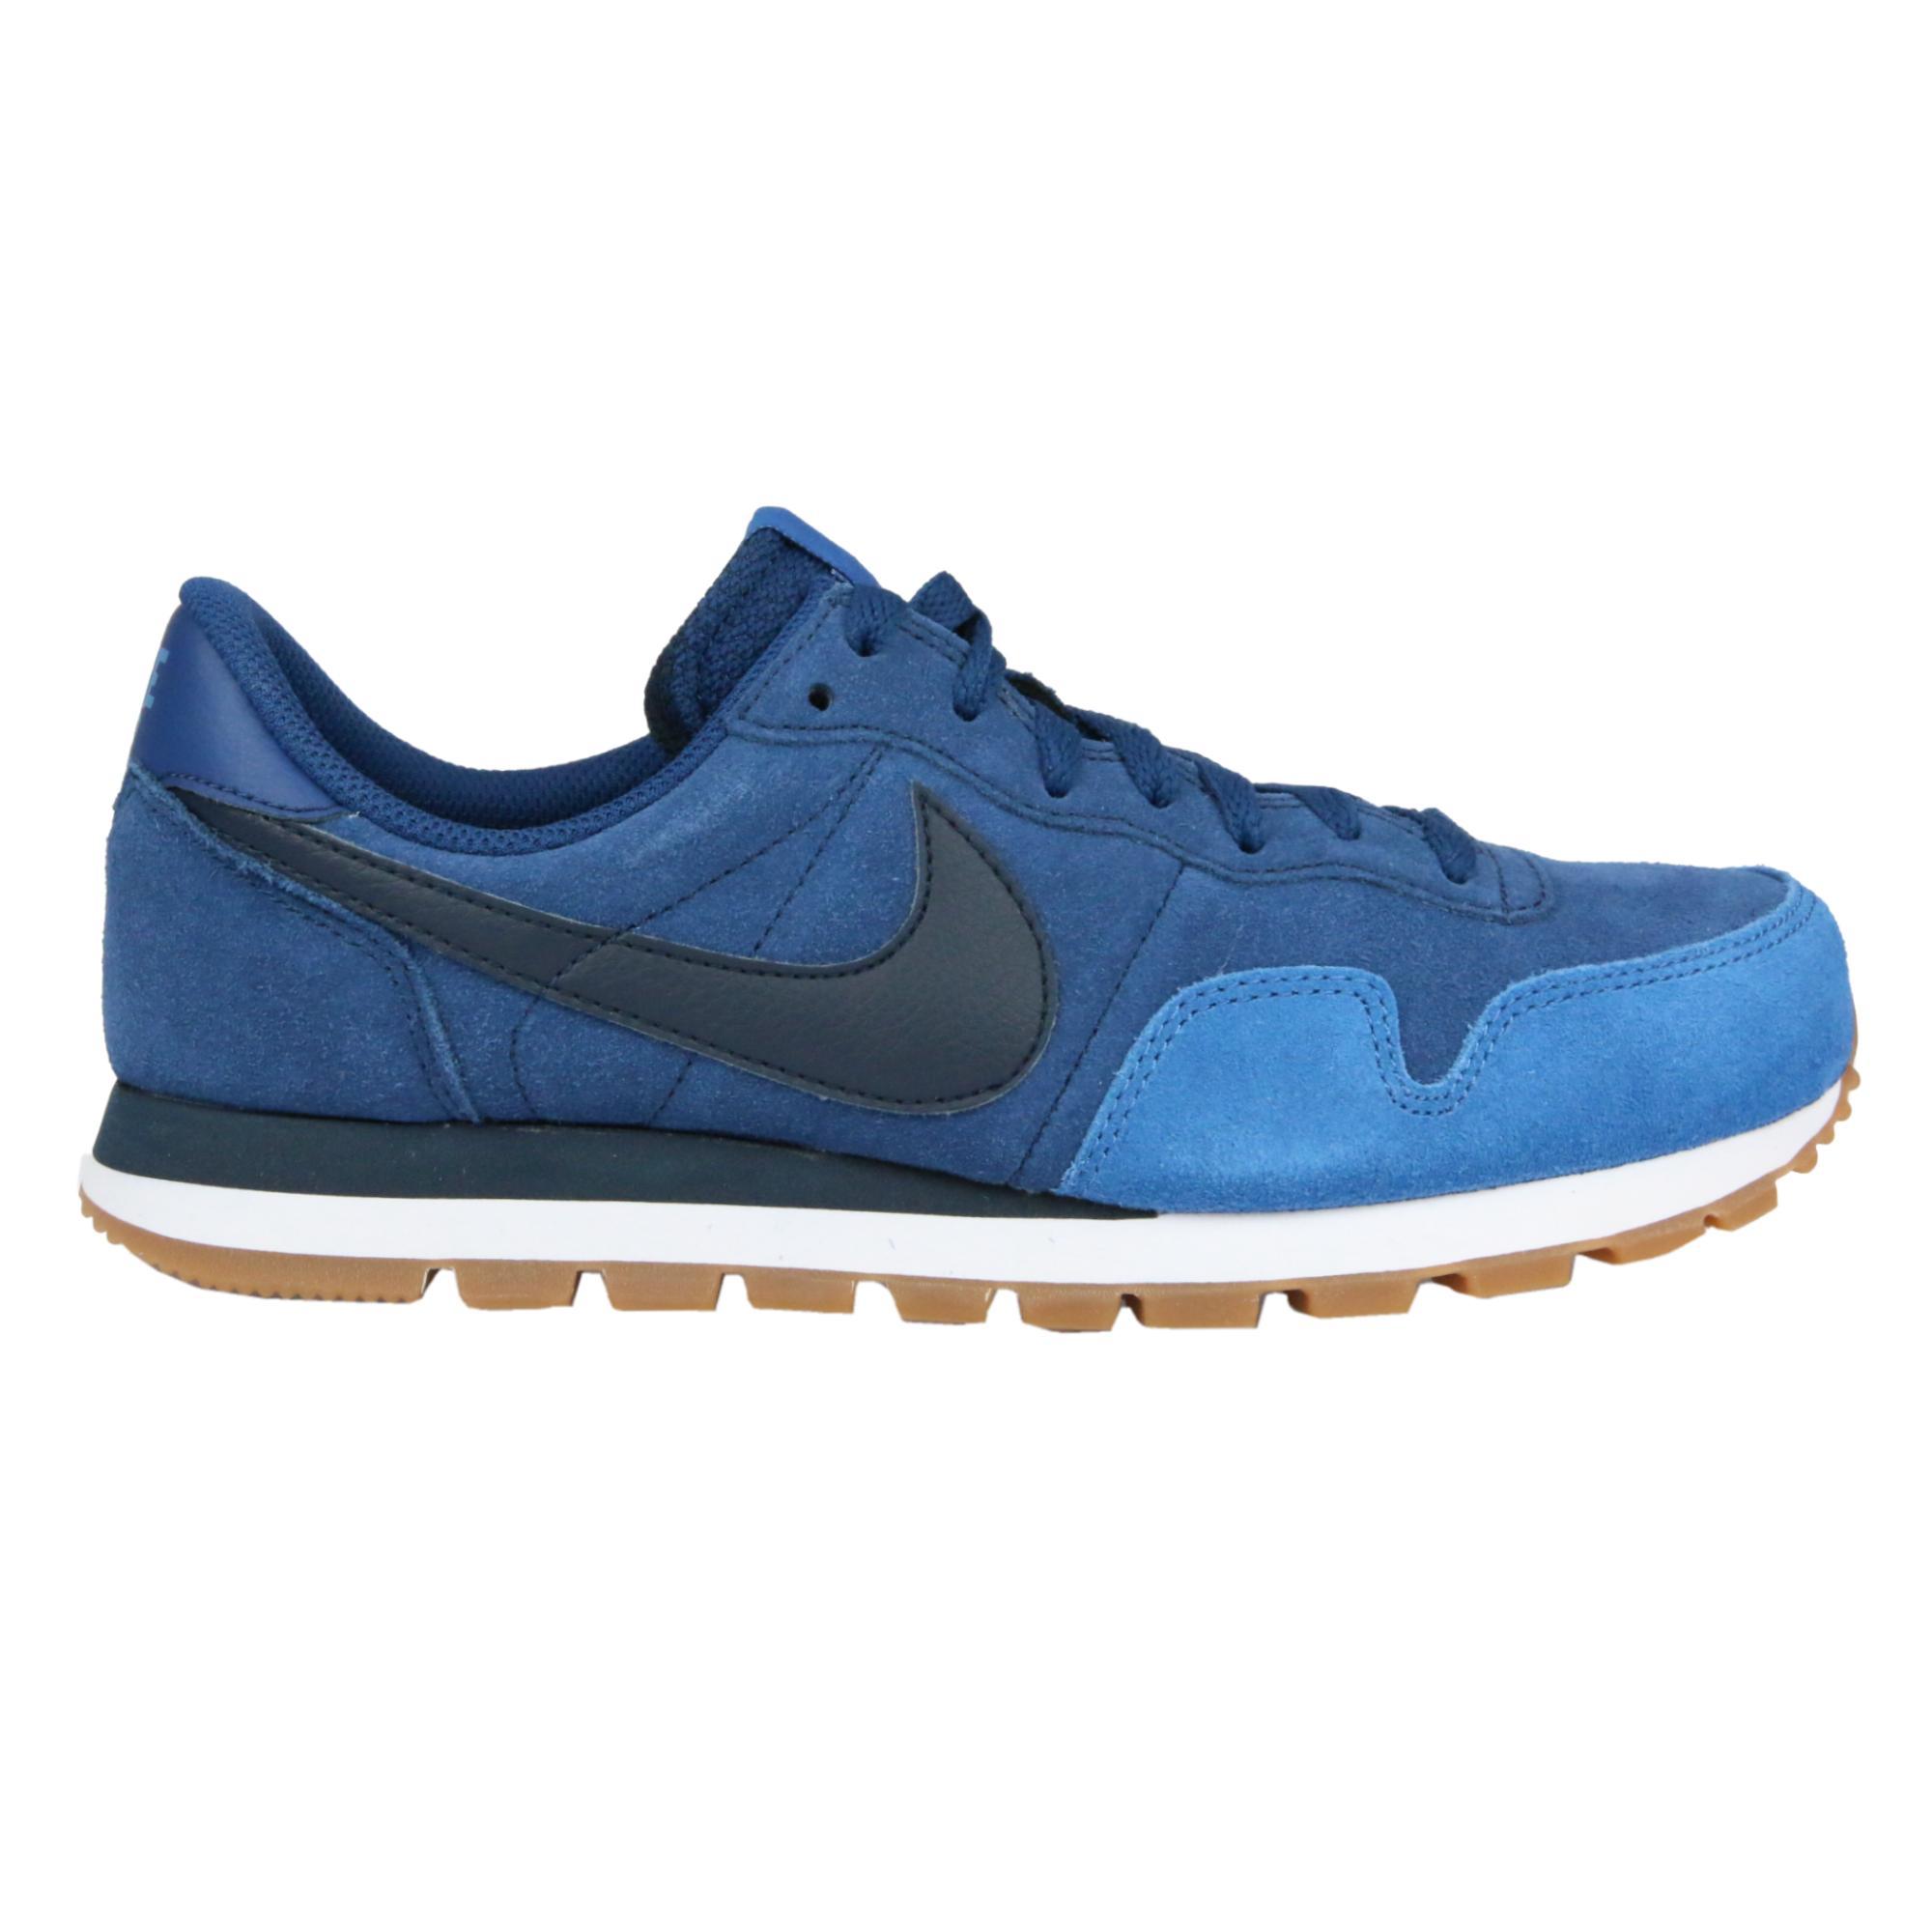 1271e705864 Supreme X Nike Air Max 98 Snake Pattern 6pm Shoes Mens